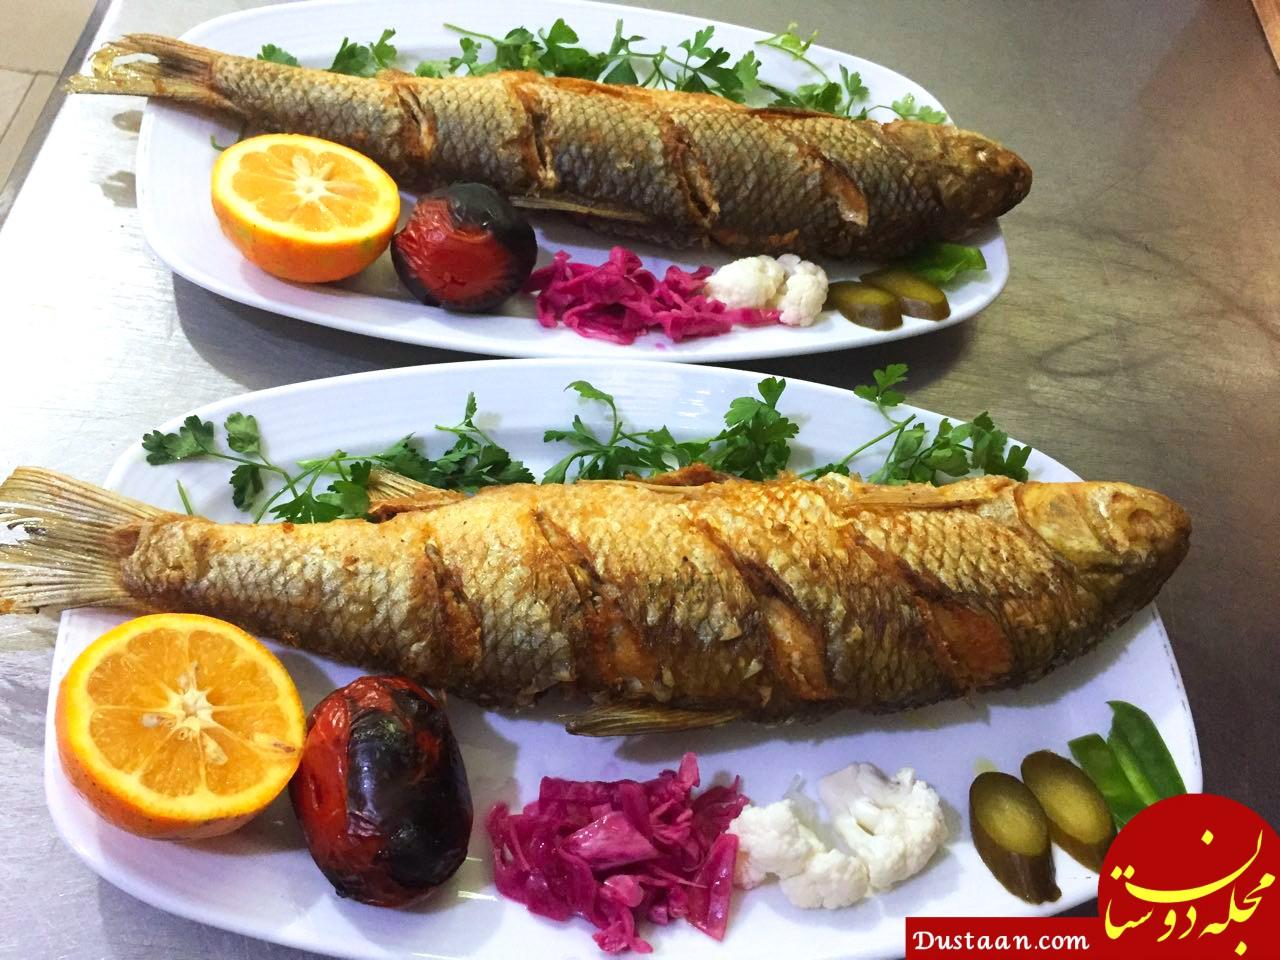 www.dustaan.com طرز تهیه 5 غذا ی بسیار خوشمزه برای عید نوروز